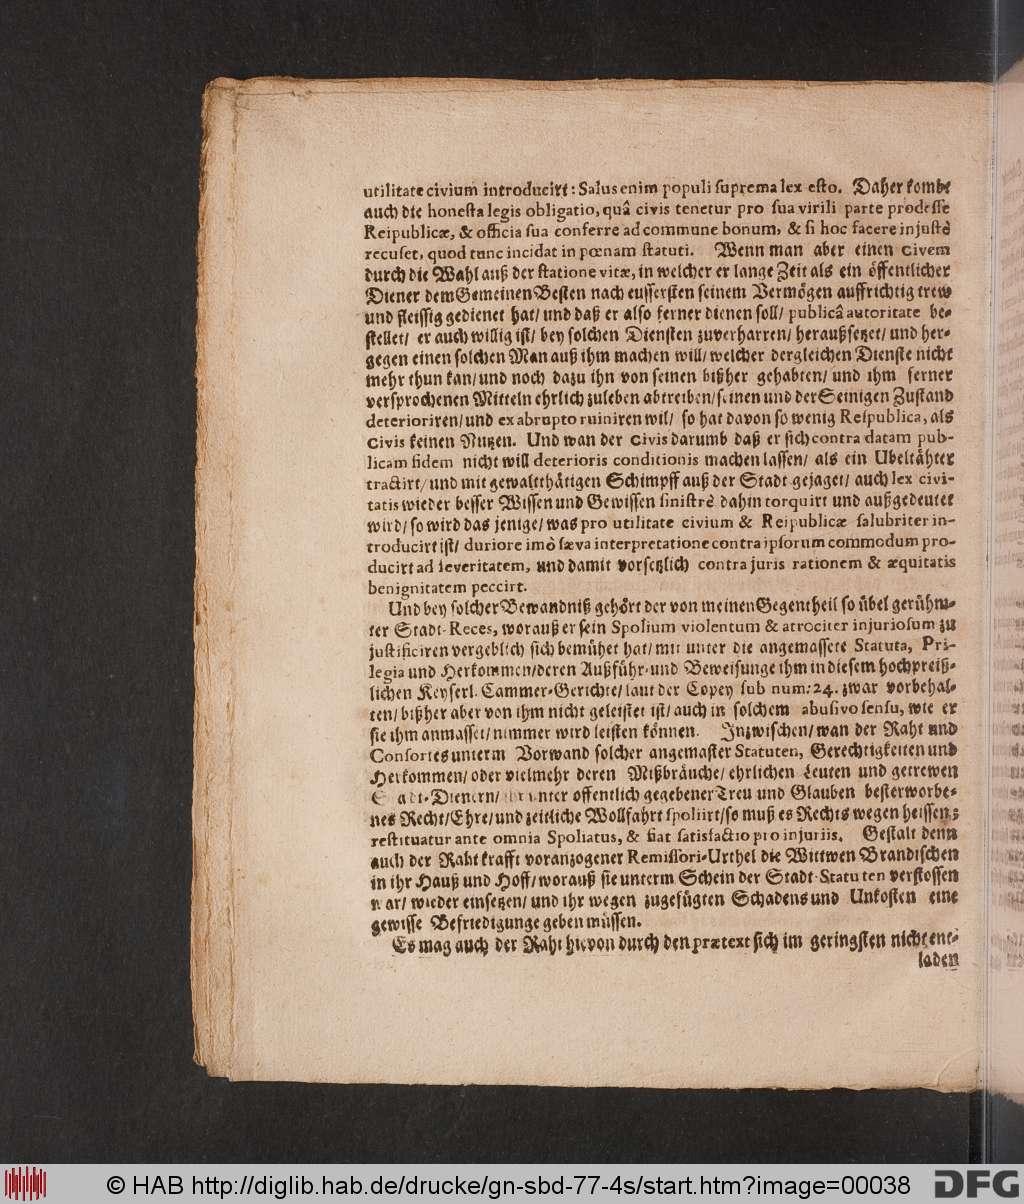 http://diglib.hab.de/drucke/gn-sbd-77-4s/00038.jpg